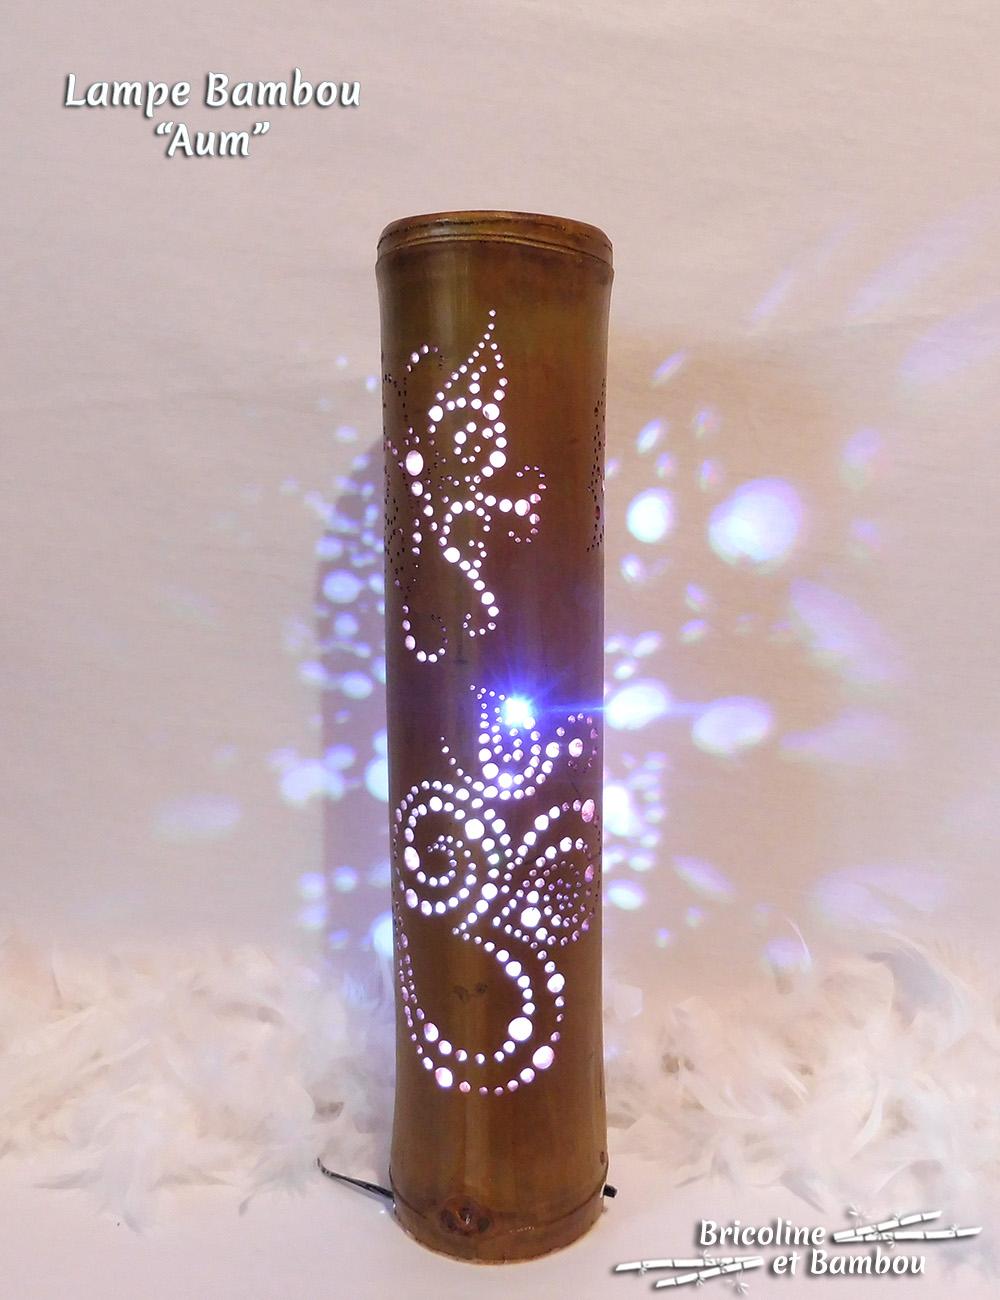 Lampe Bambou Aum